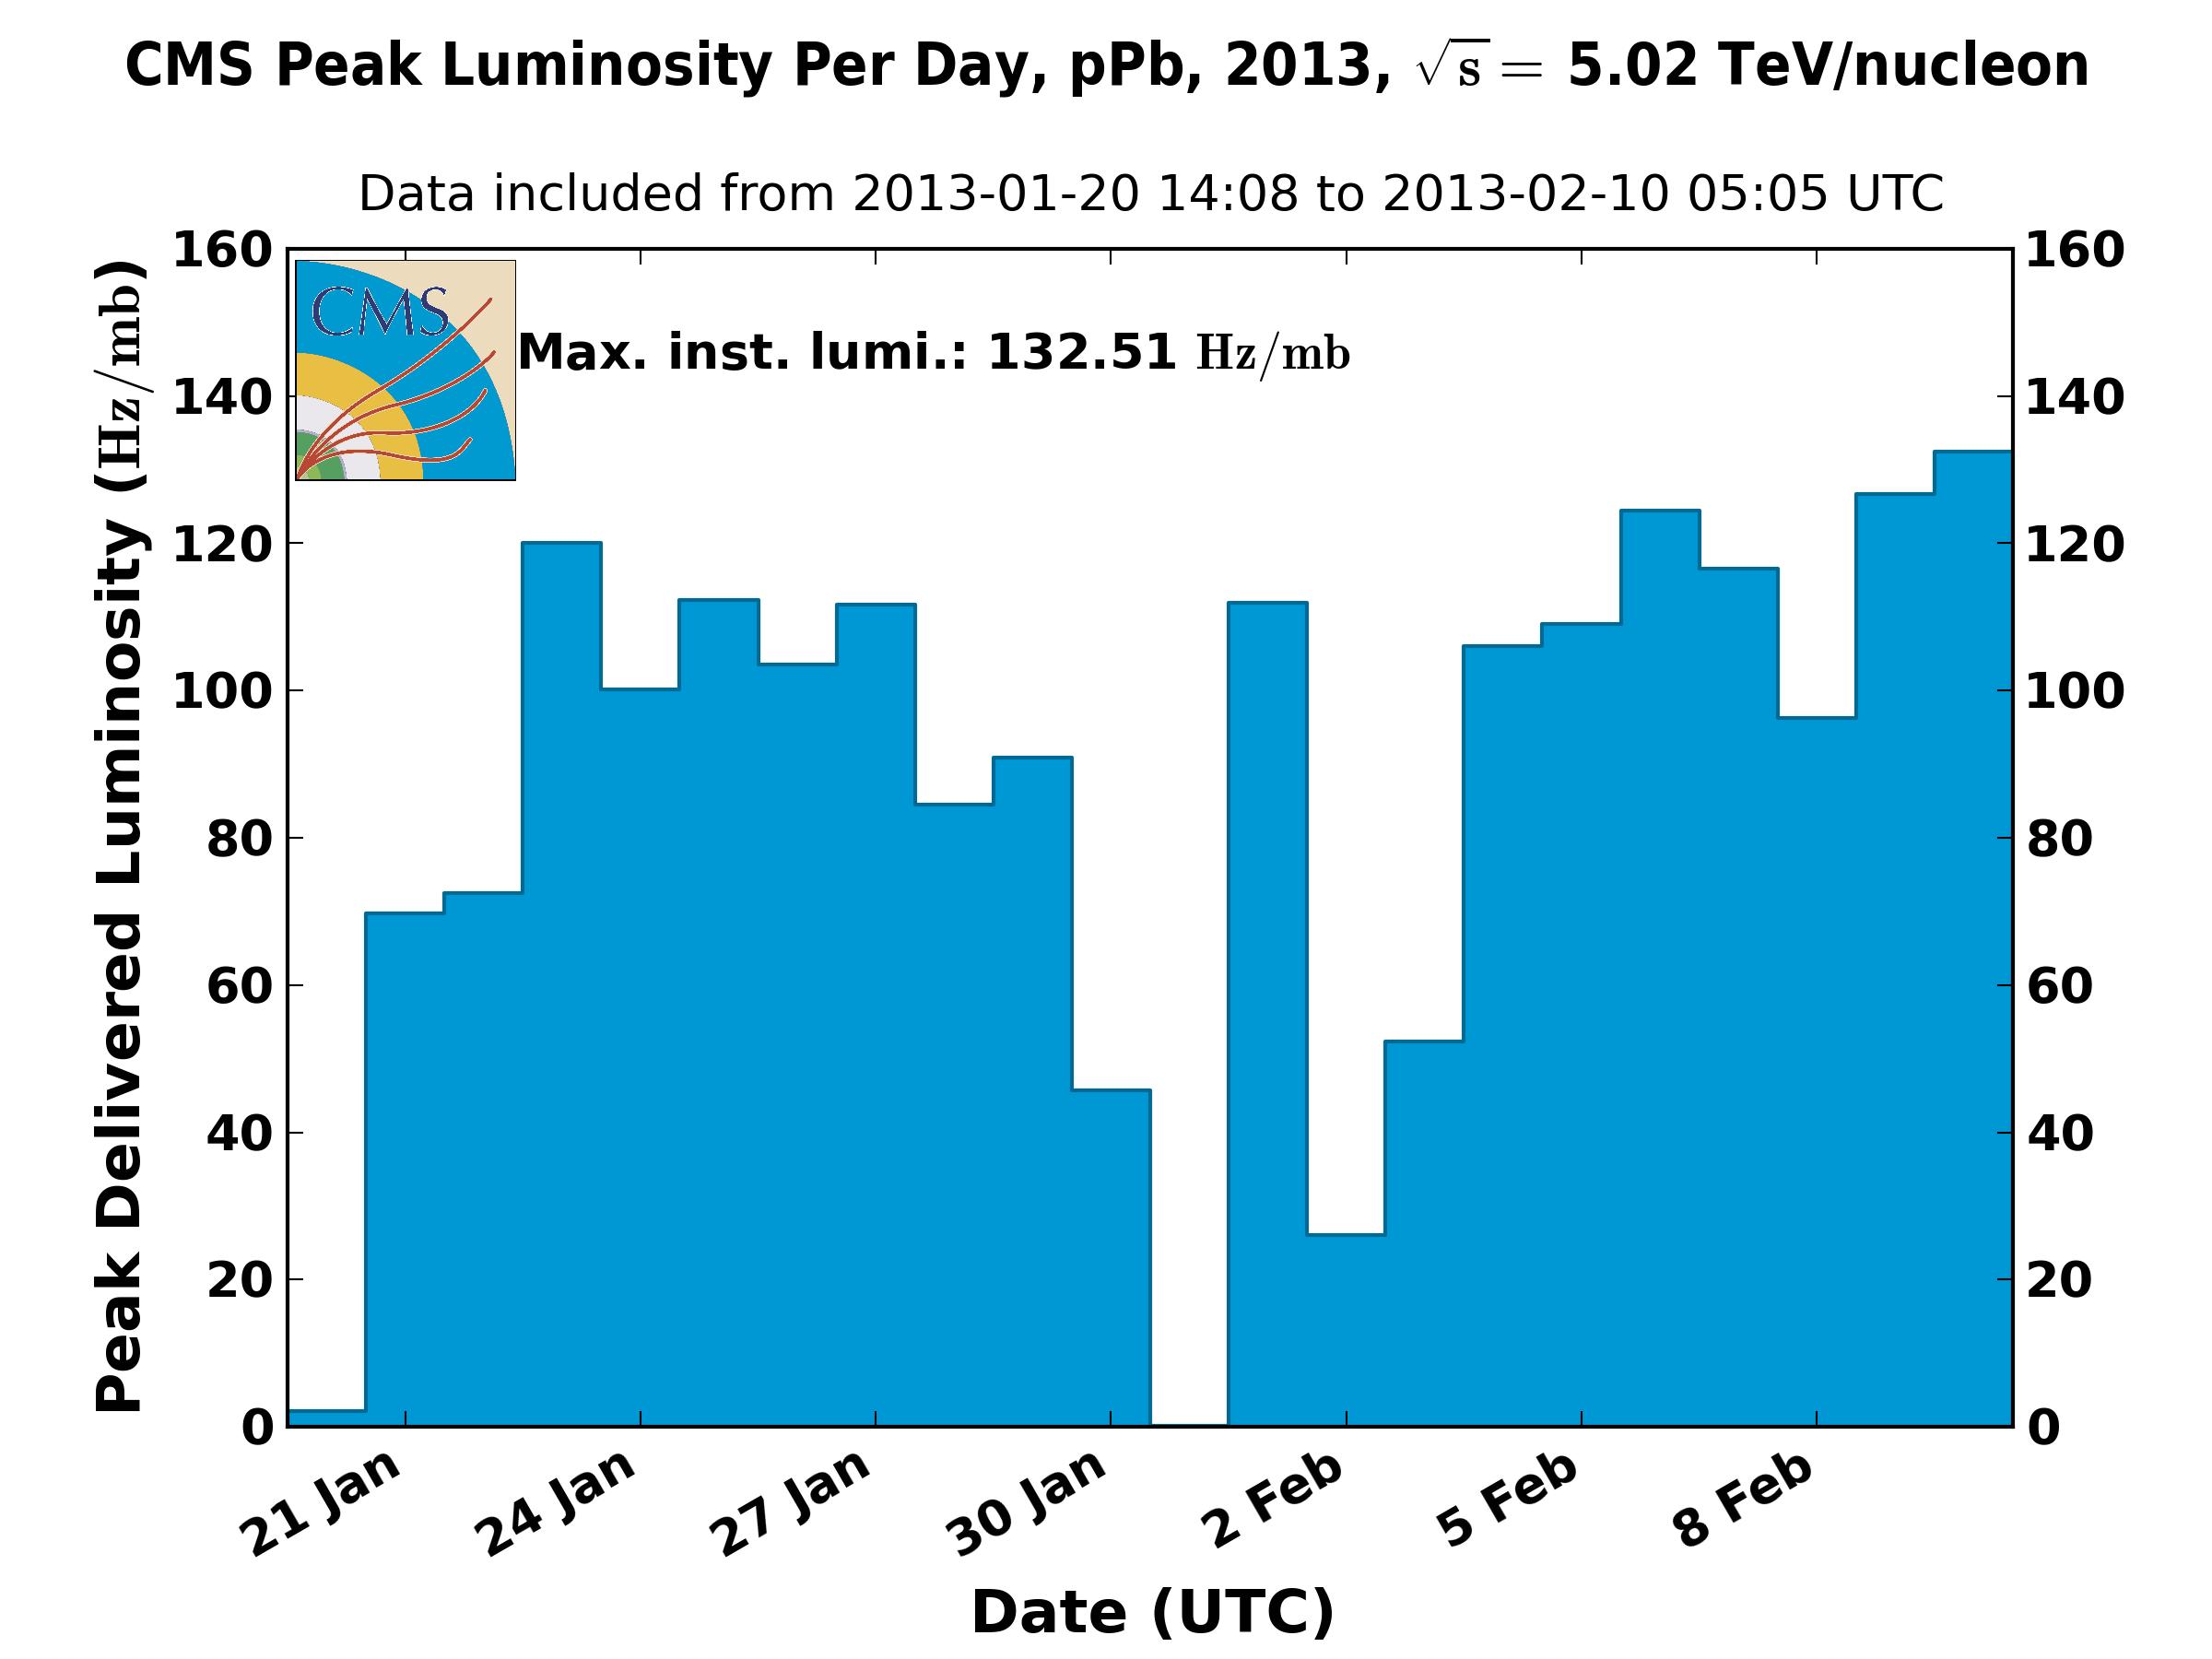 https://cern.ch/cmslumi/publicplots/peak_lumi_per_day_ppb_2013.png